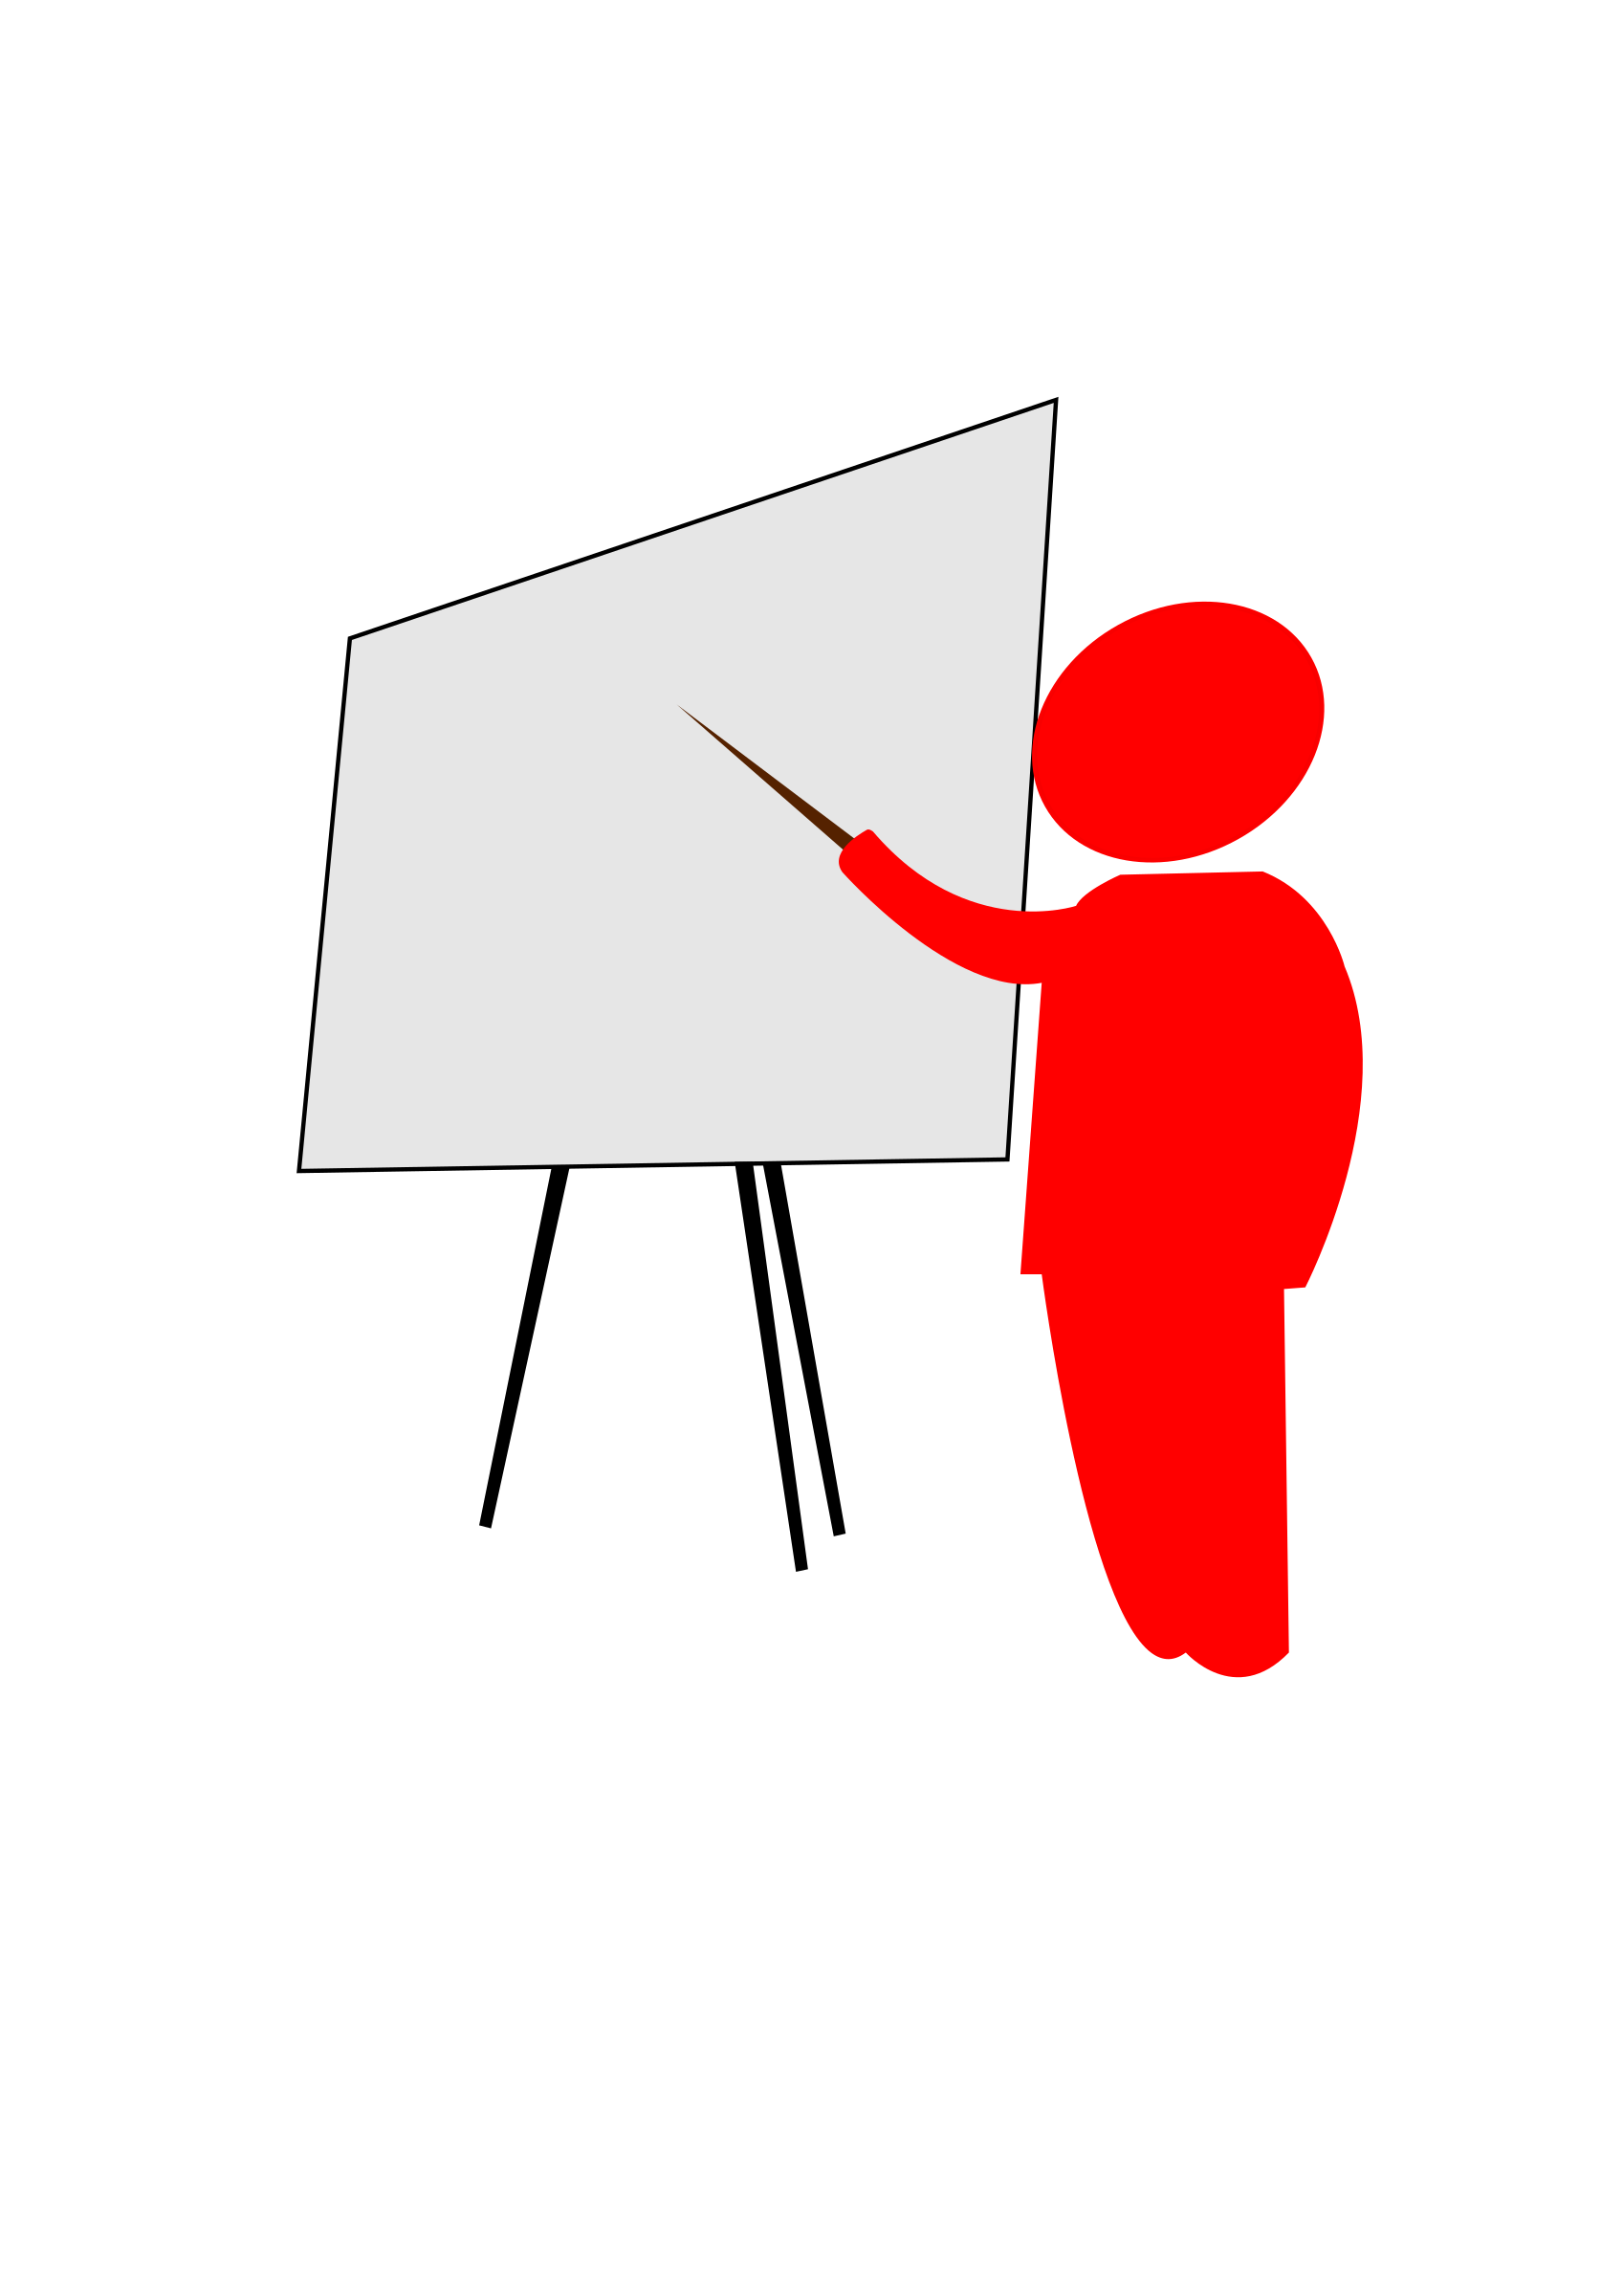 Clipart - teacher explains pointing to the blackboard